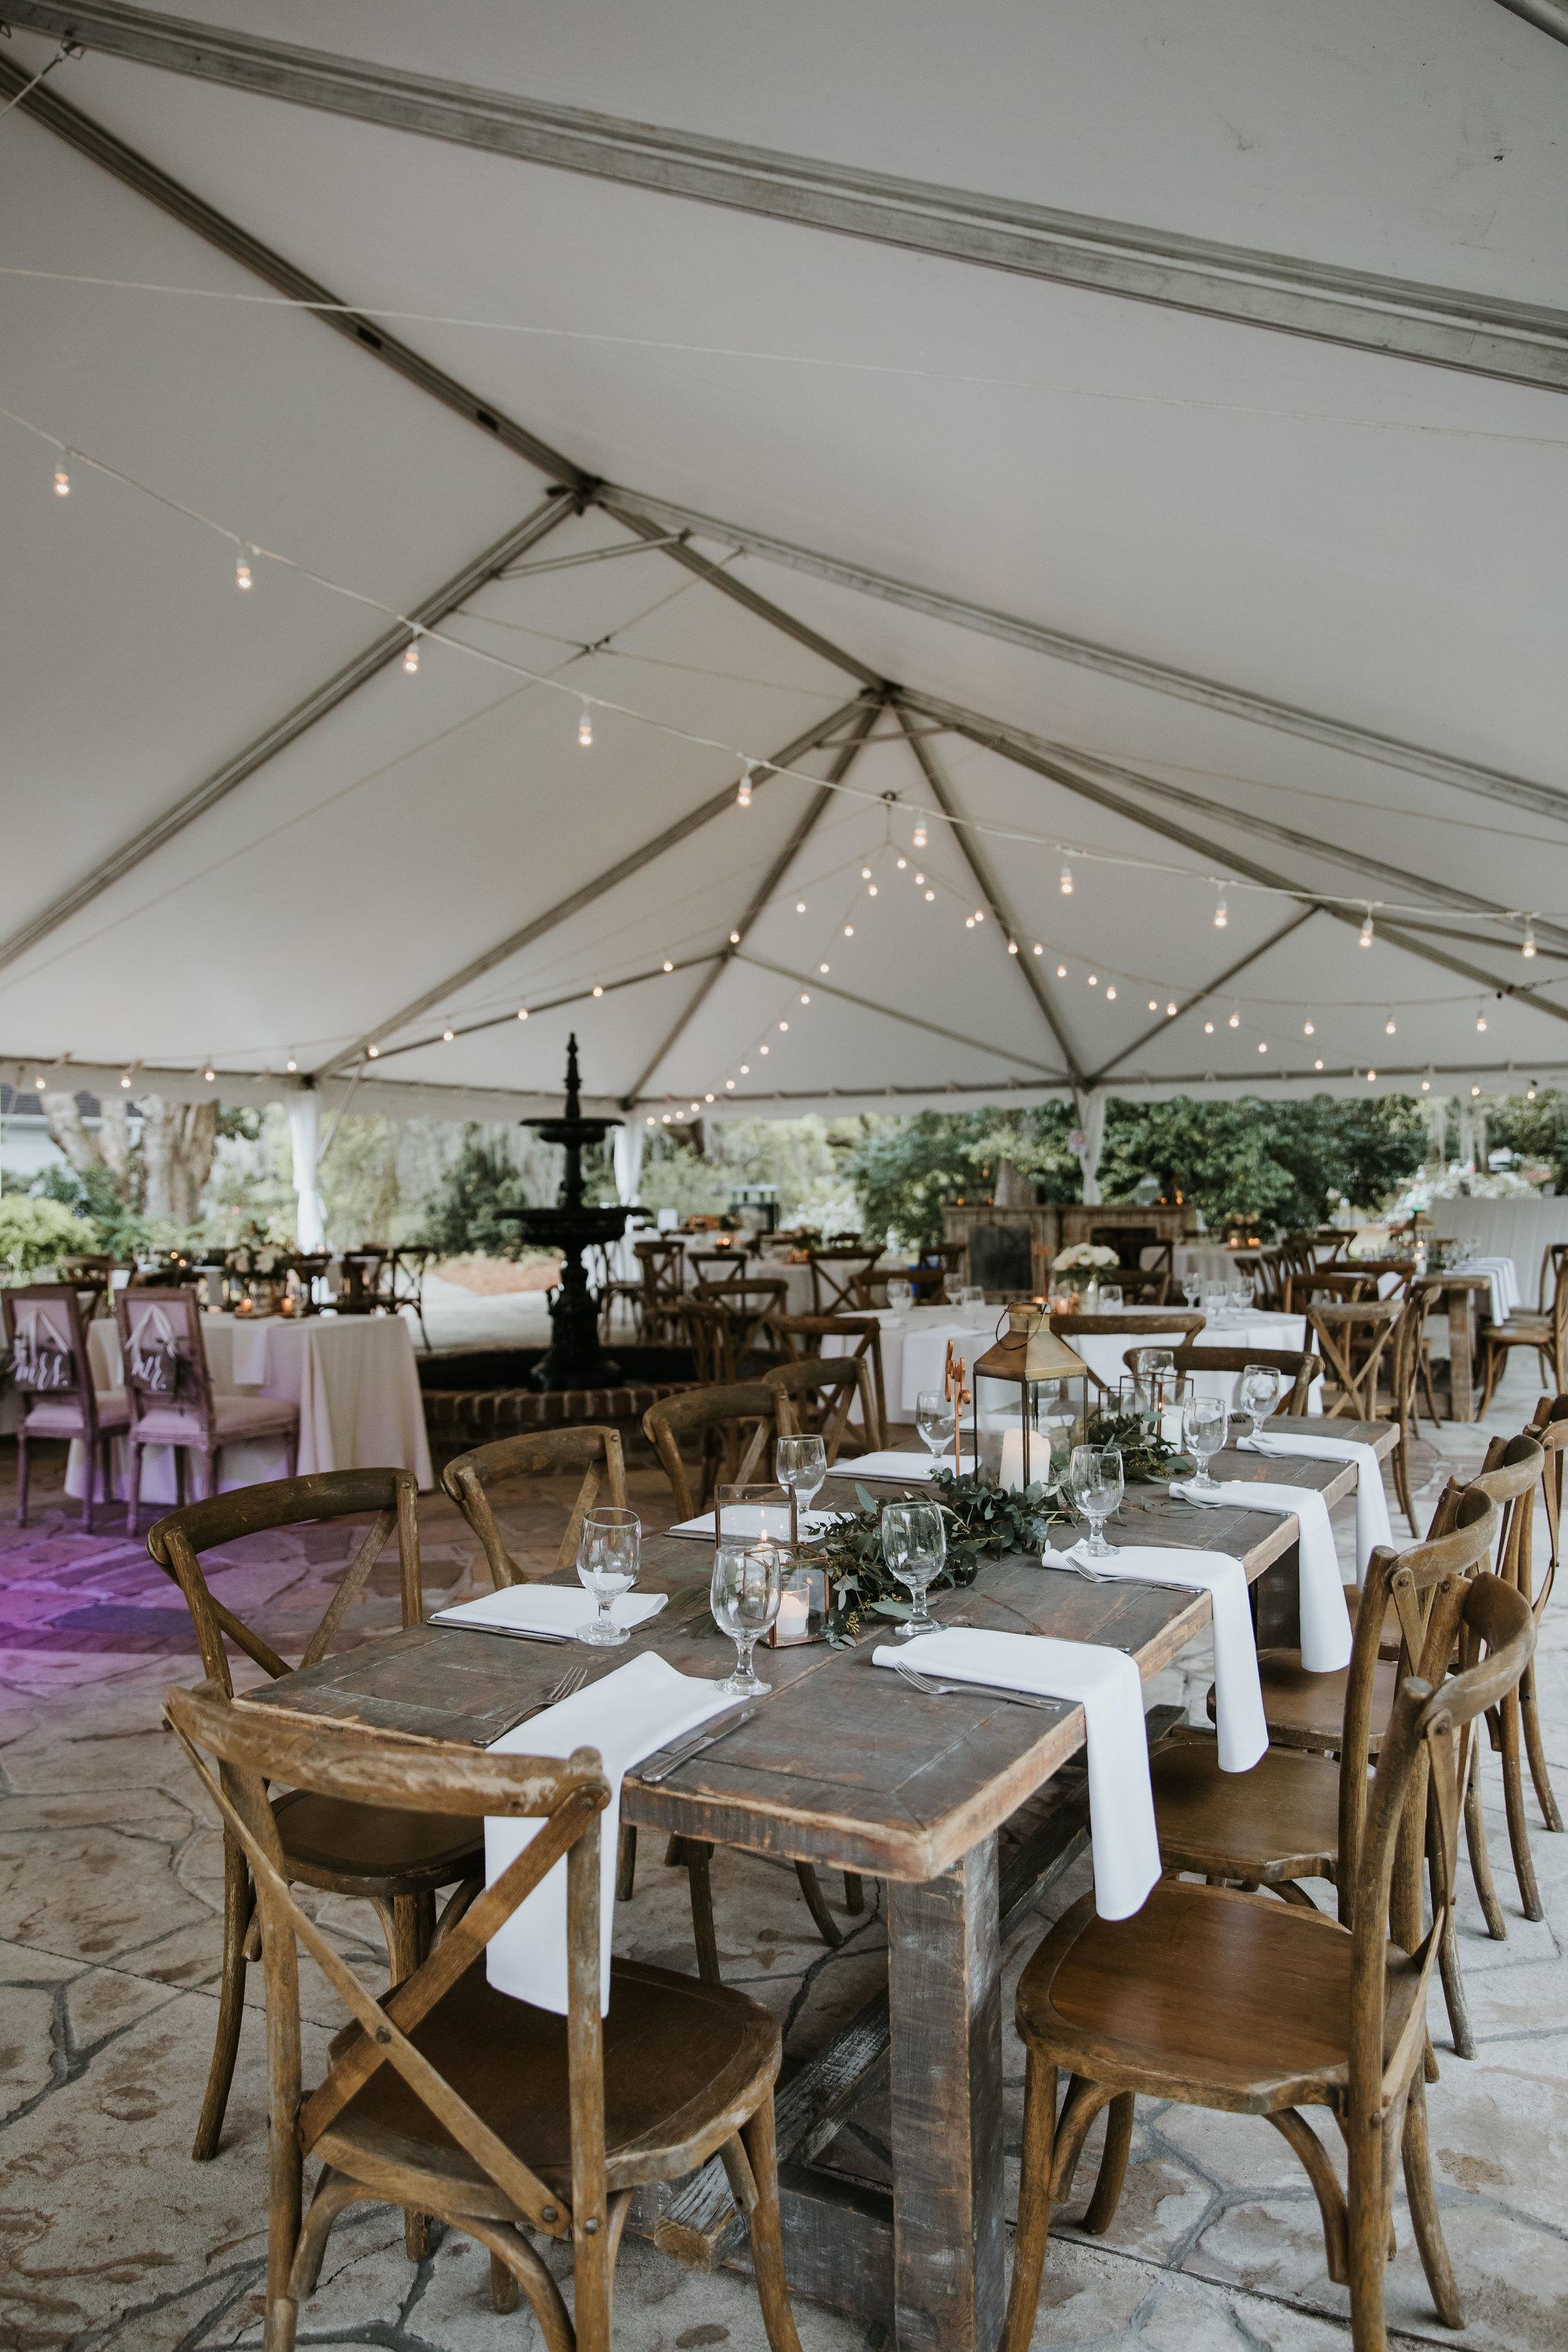 Legare-Waring-House-Charleston-SC-wedding-portrait-photography-383.jpg